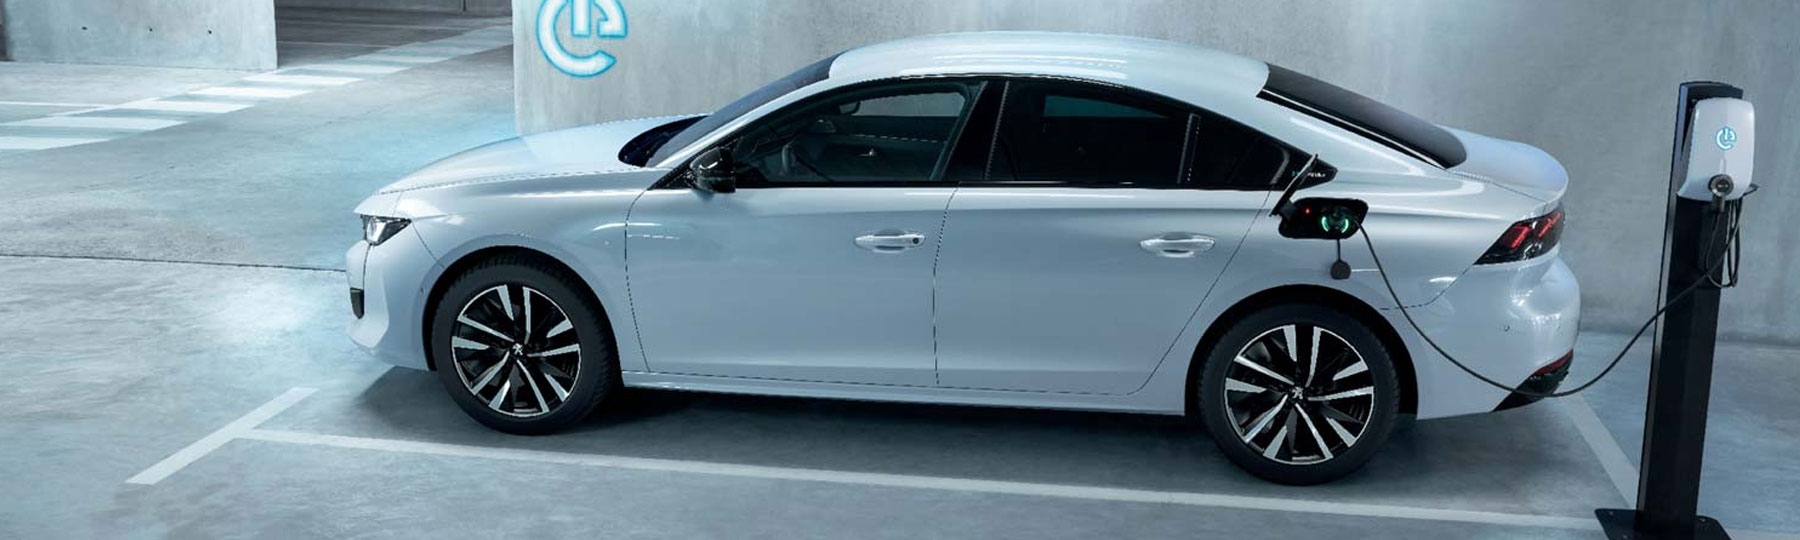 peugeot 508 Hybrid Business Offer